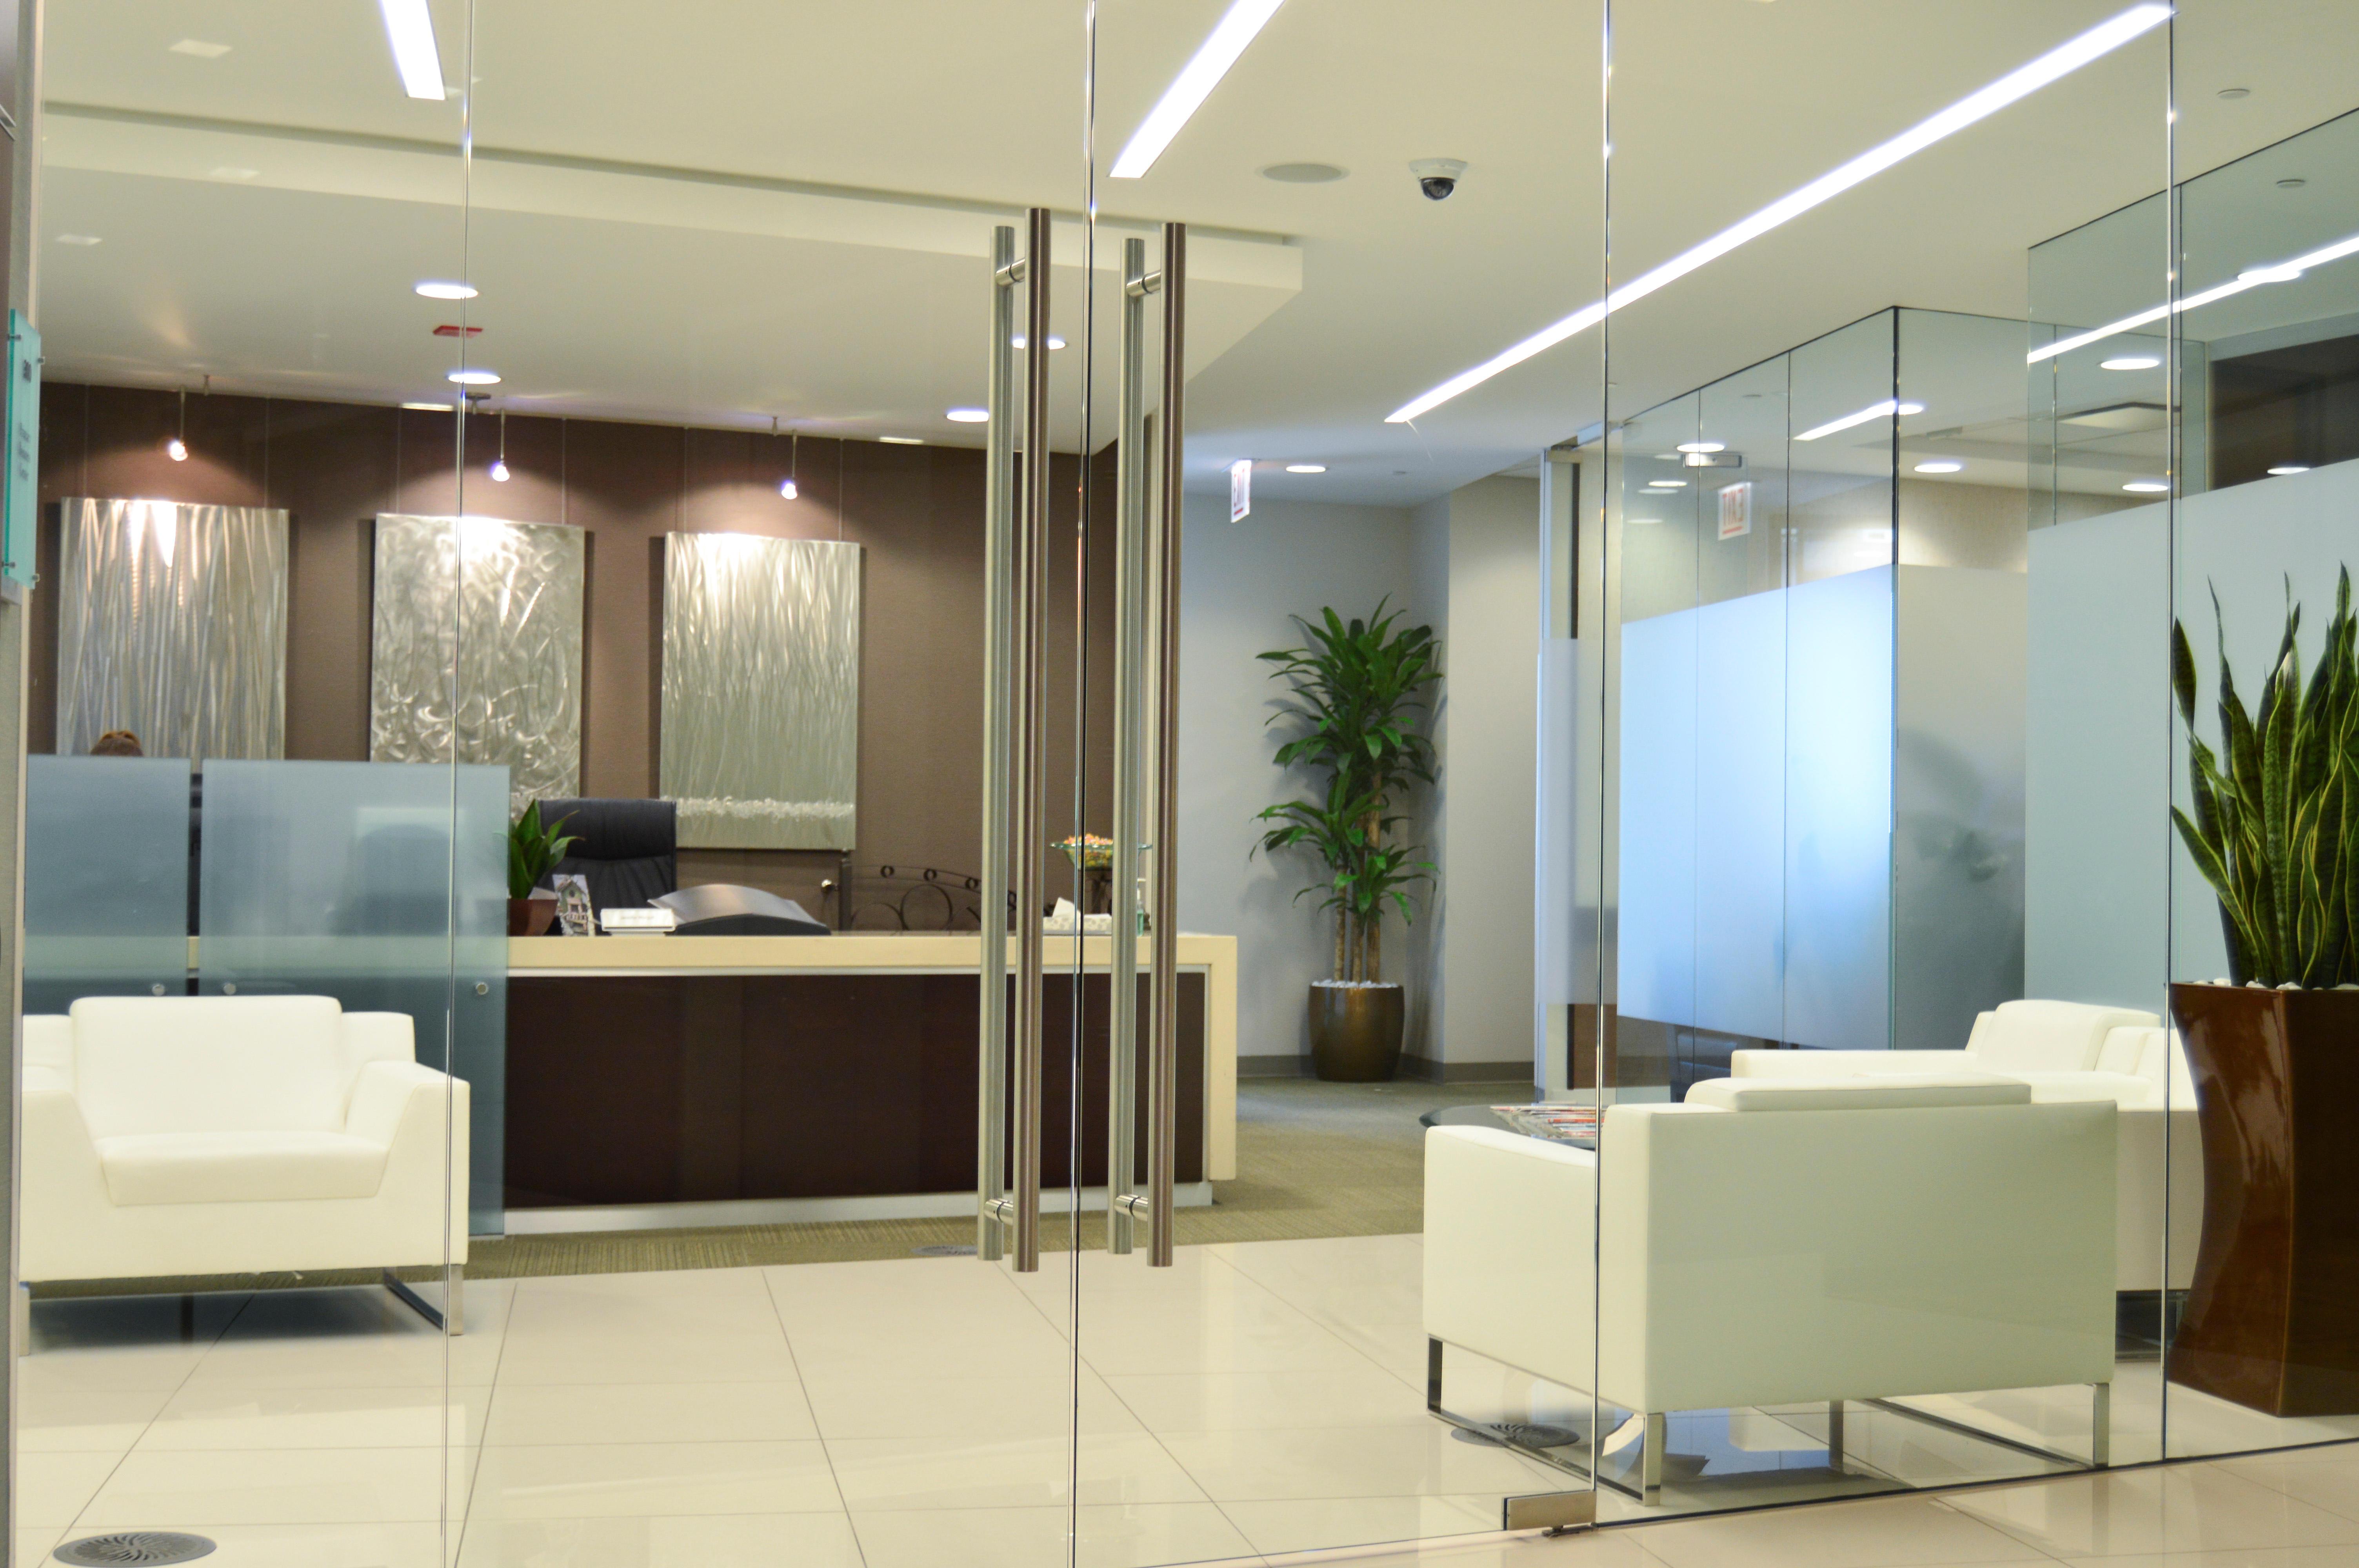 Robertson Legal Group LLC image 4